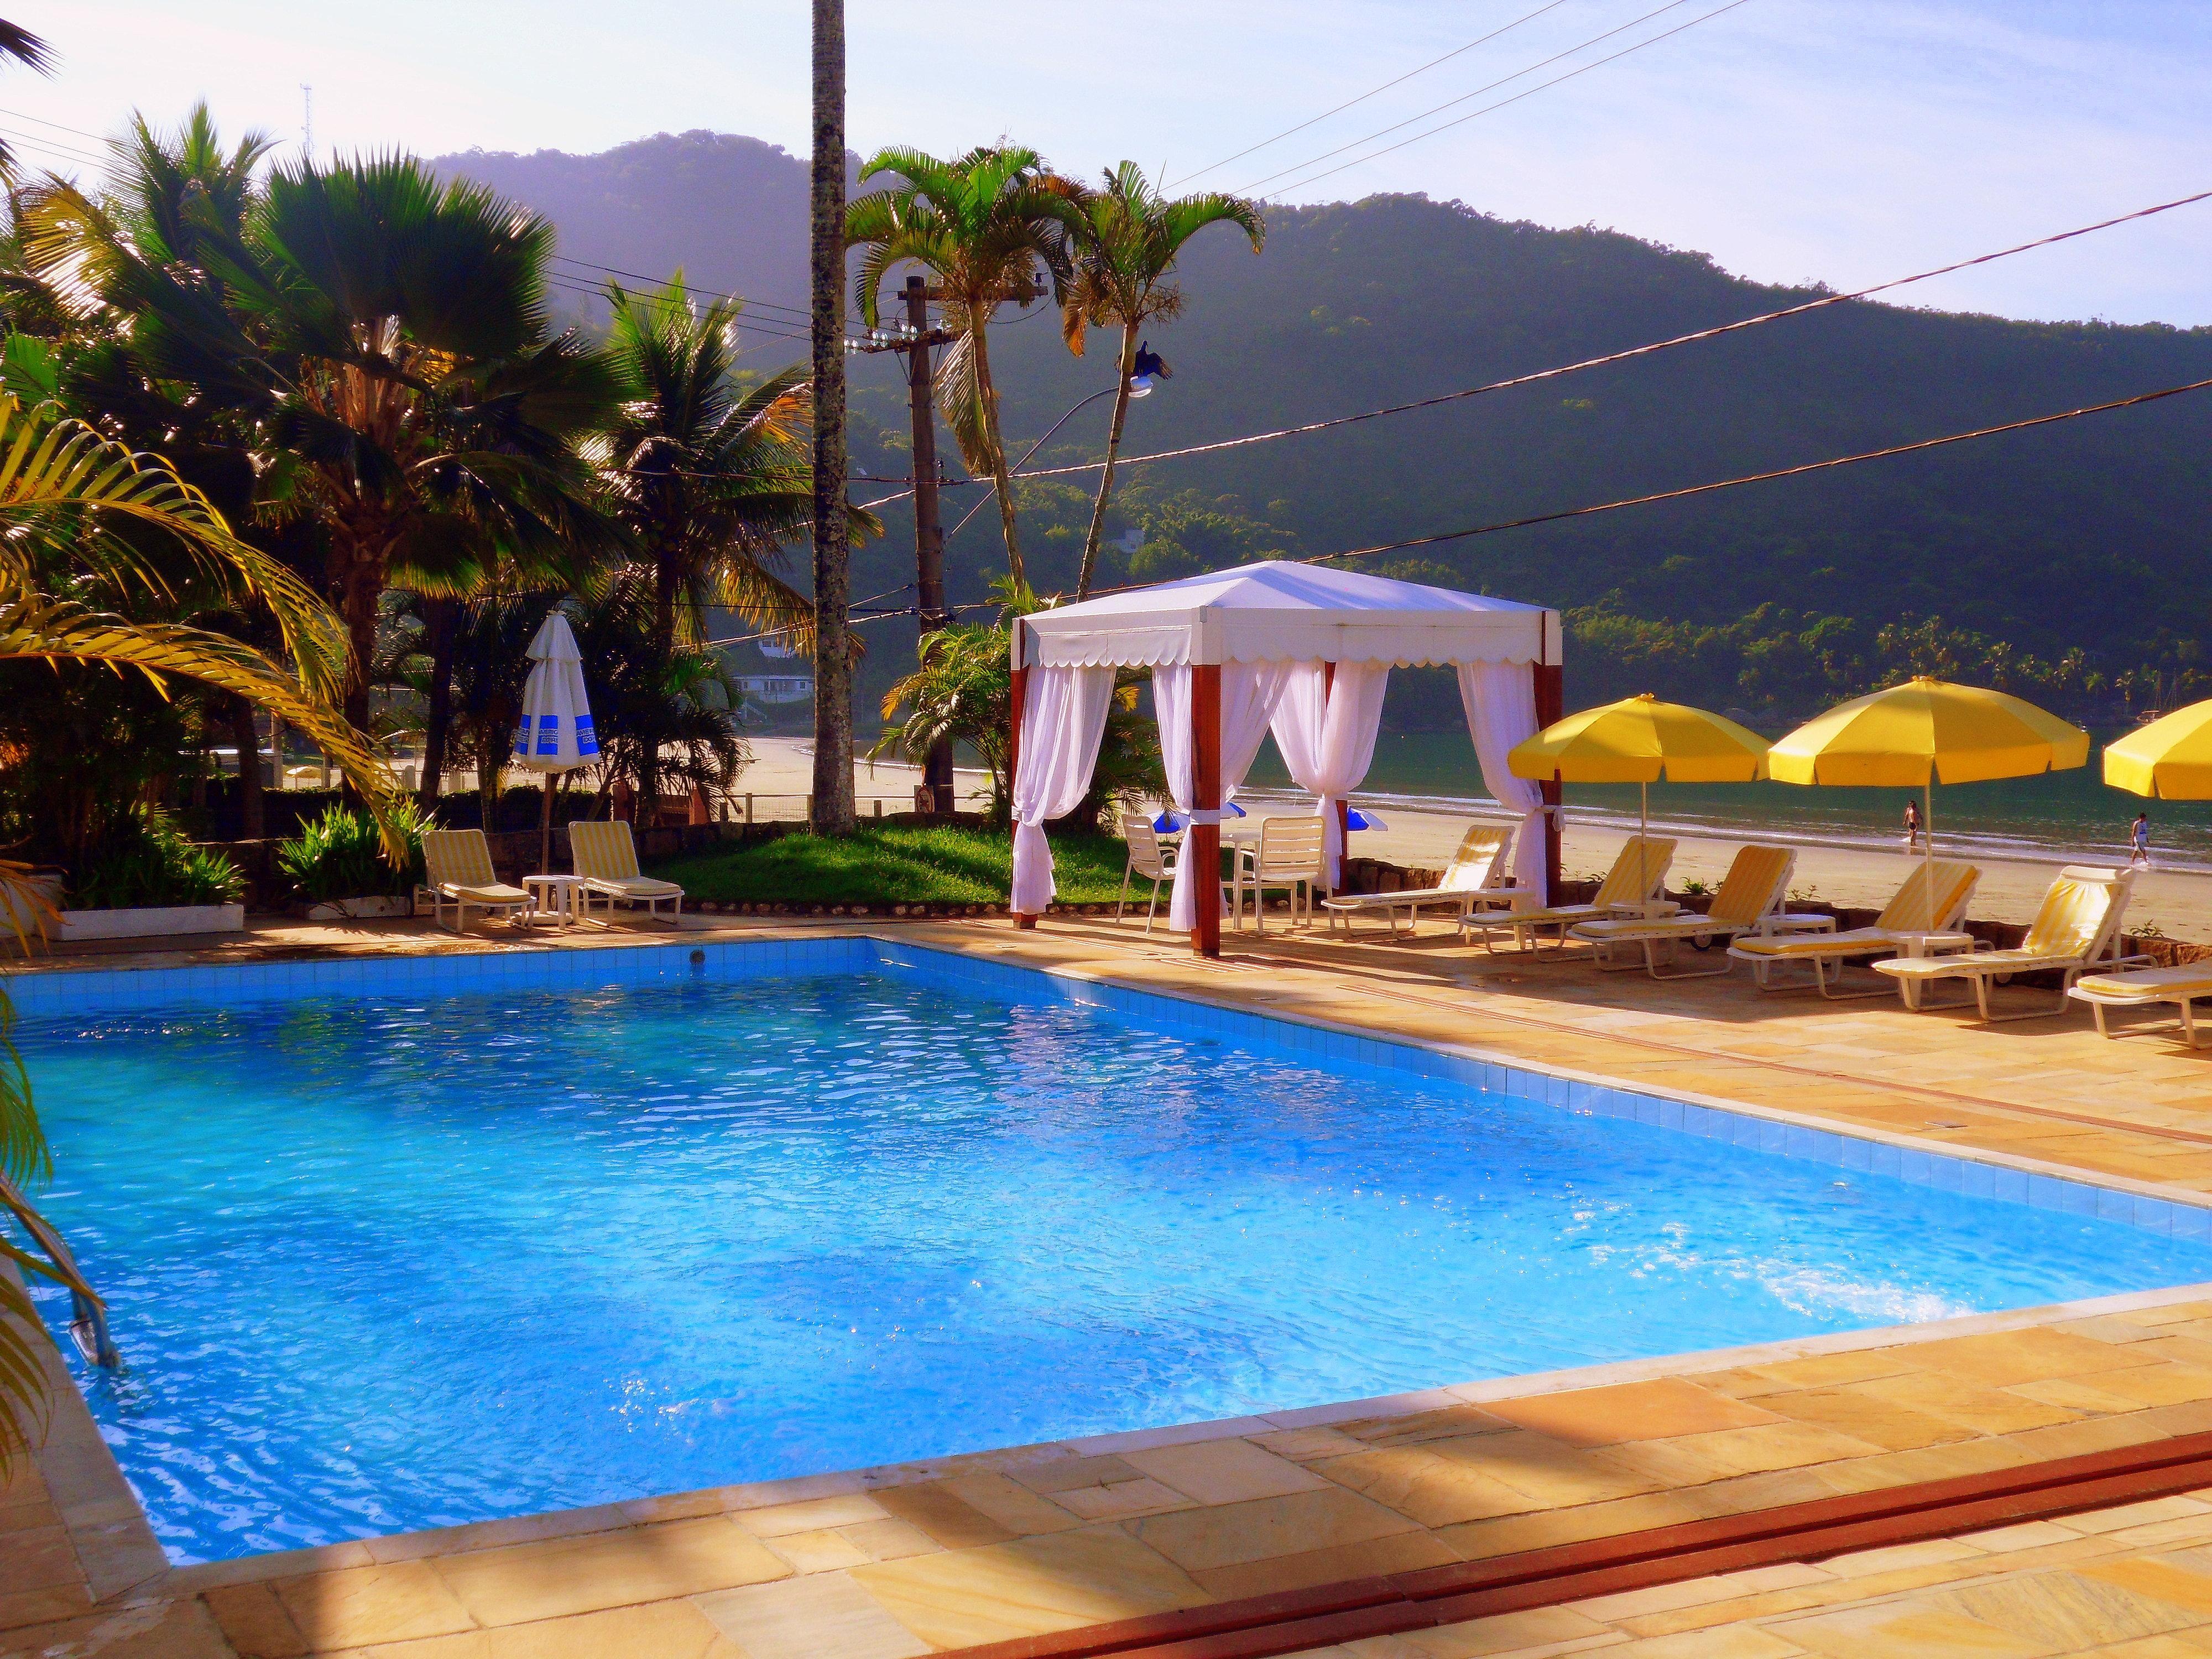 Hotel torremolinos ubatuba s o paulo piscina for Hotel kristal torremolinos piscina